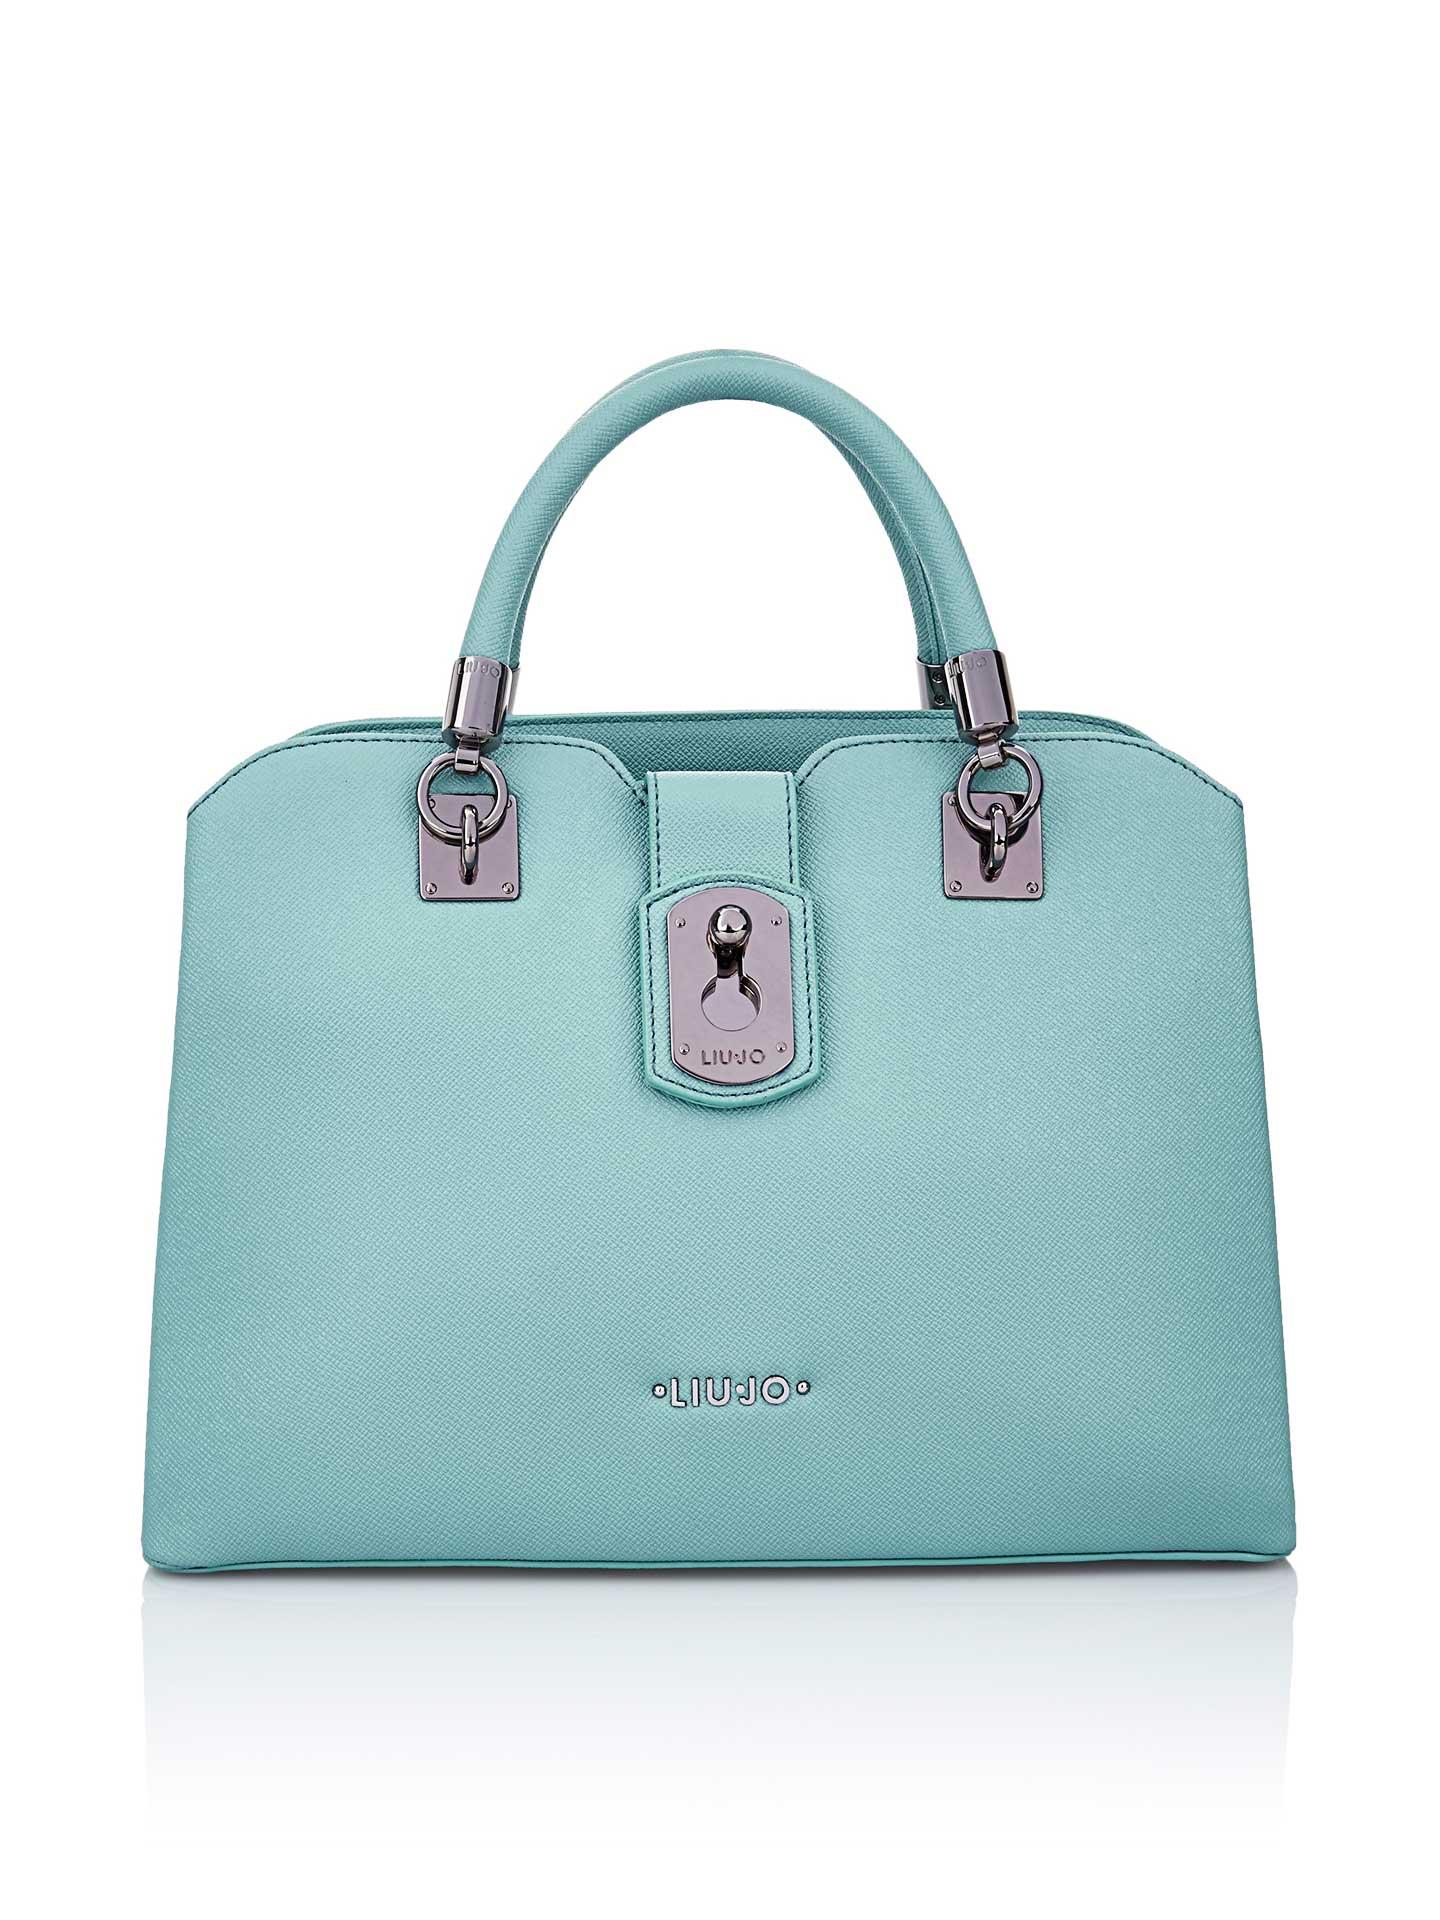 Borse Bag Liu Jo : Liu jo borse scontate